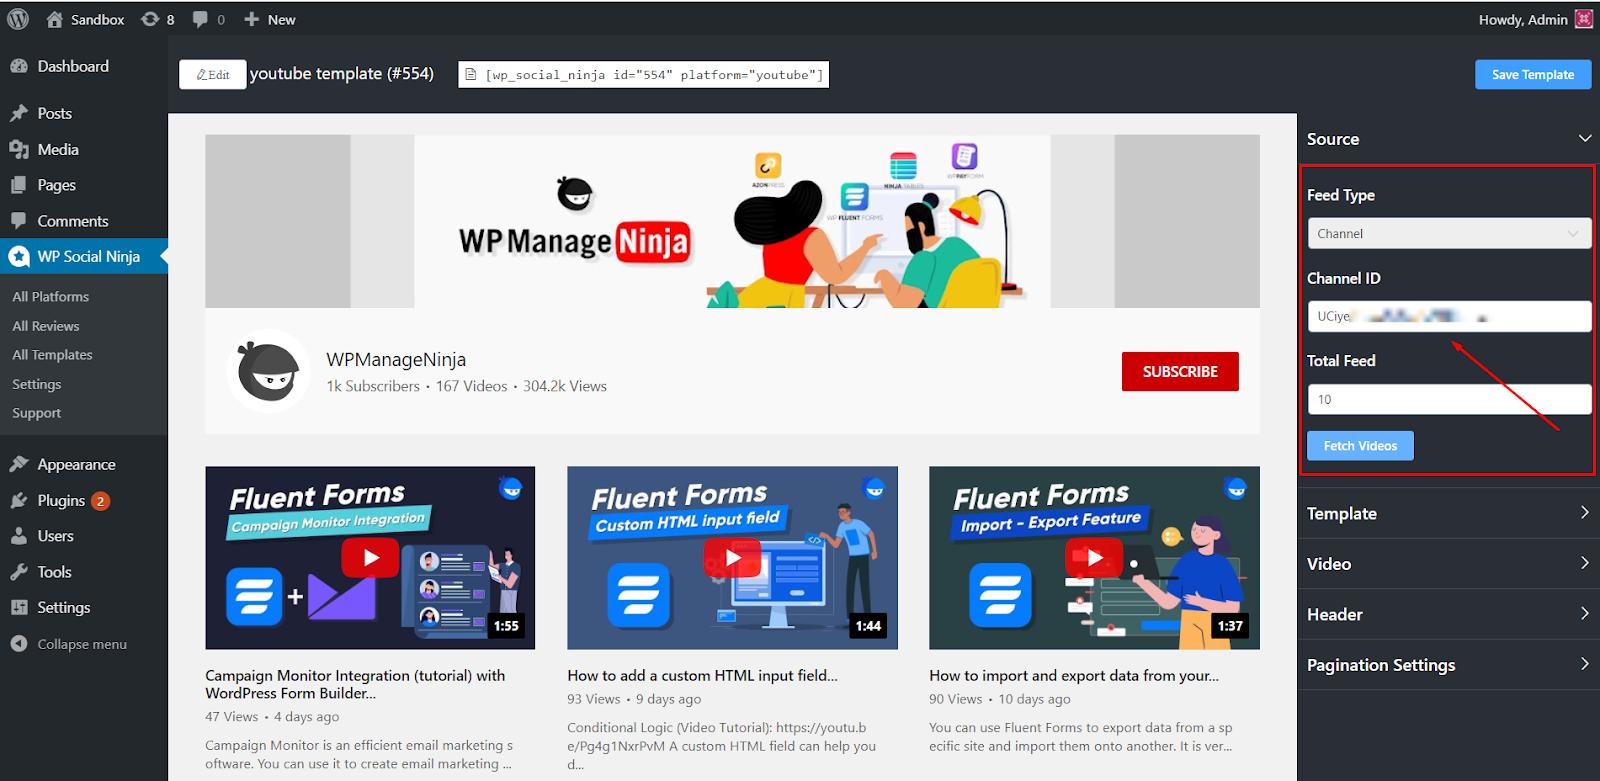 YouTube feed Channel ID